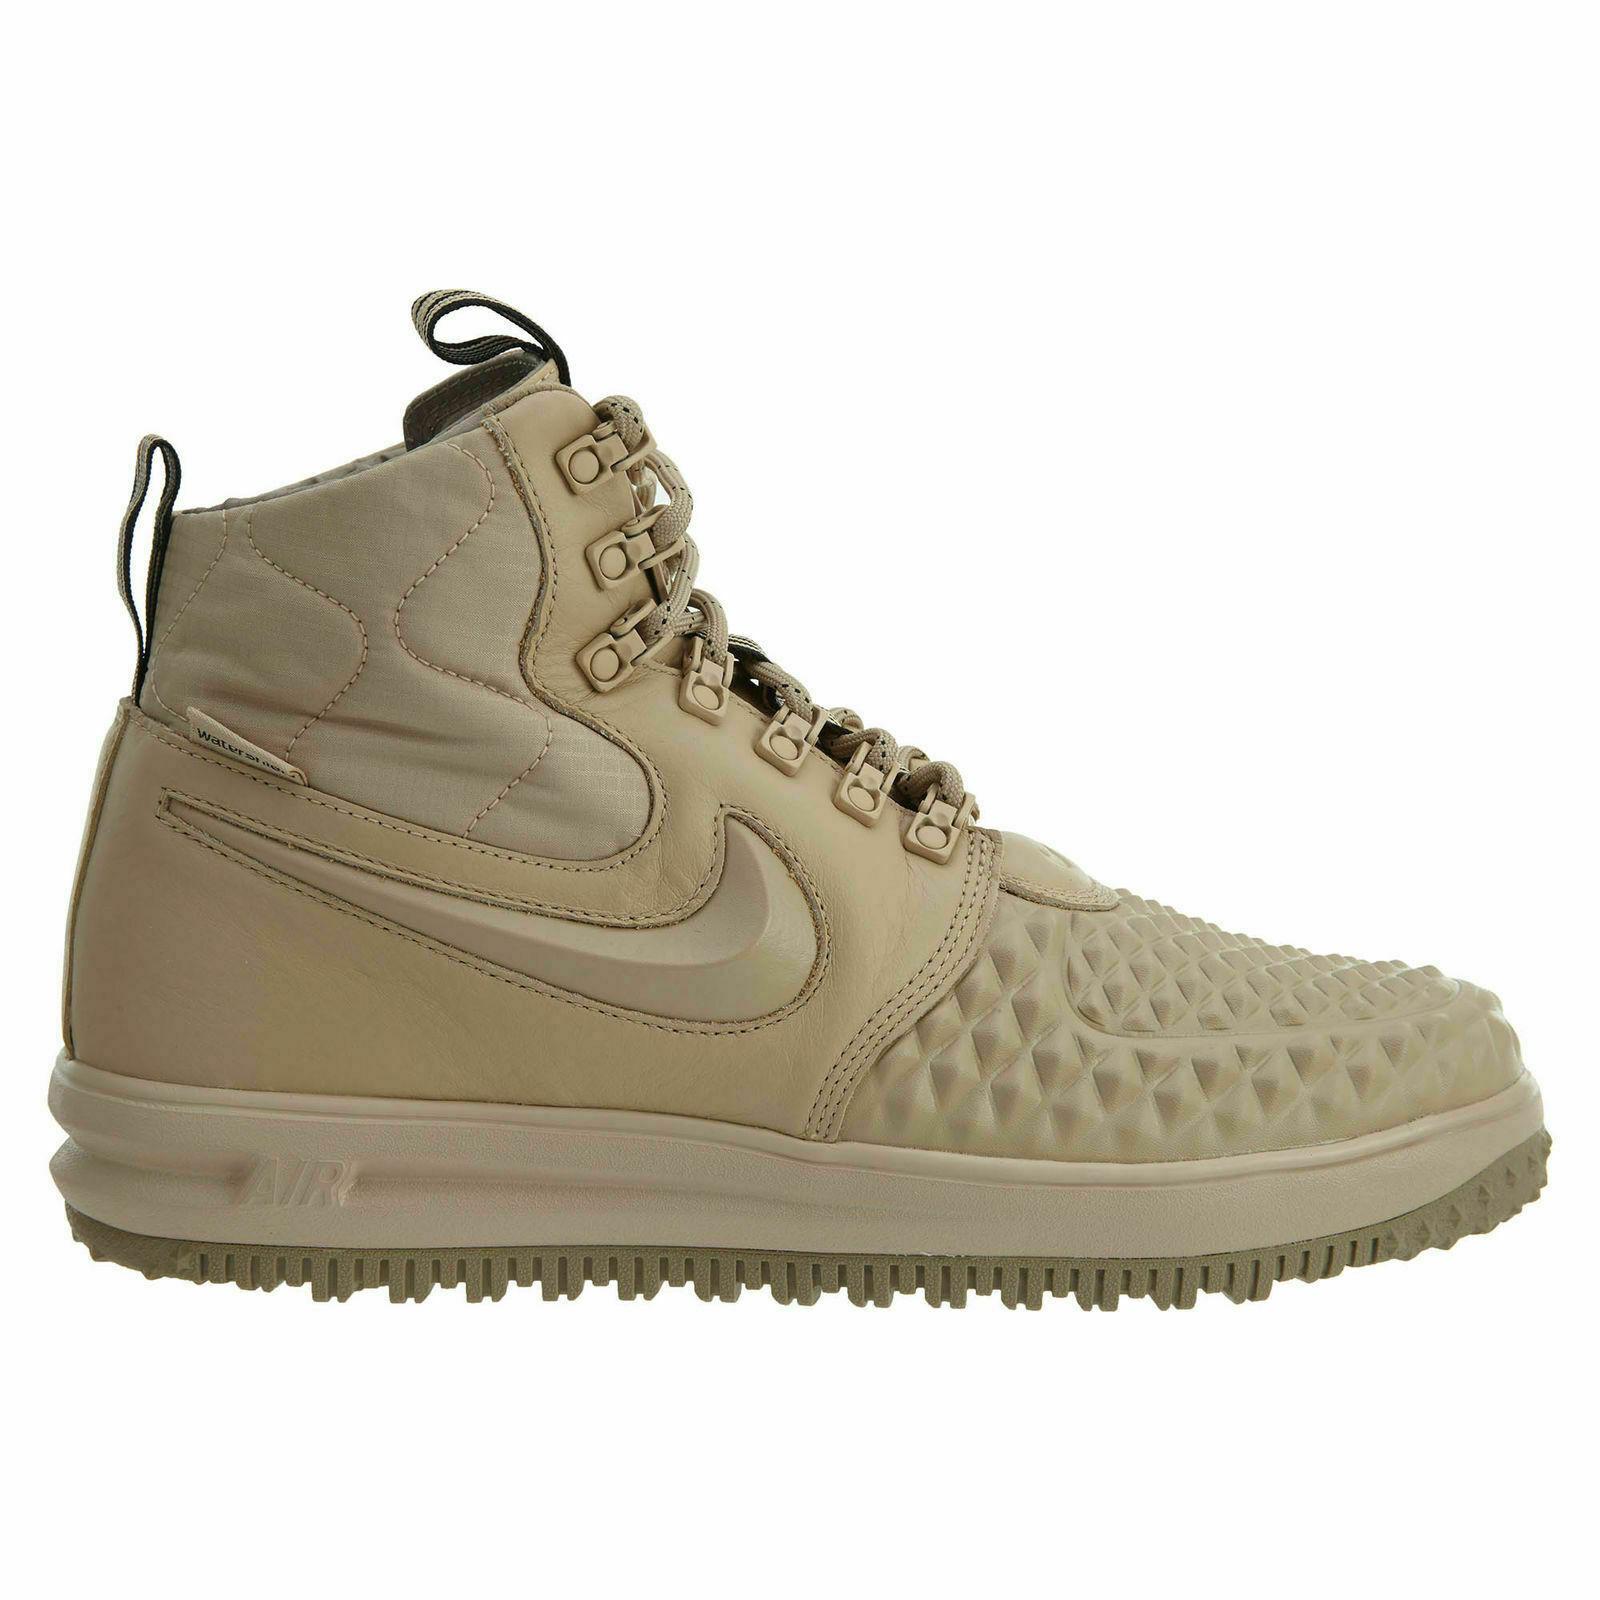 17e8035163212b Nike LF1 Duckboot  17 Men s shoes Size 9.5 Style 916682201